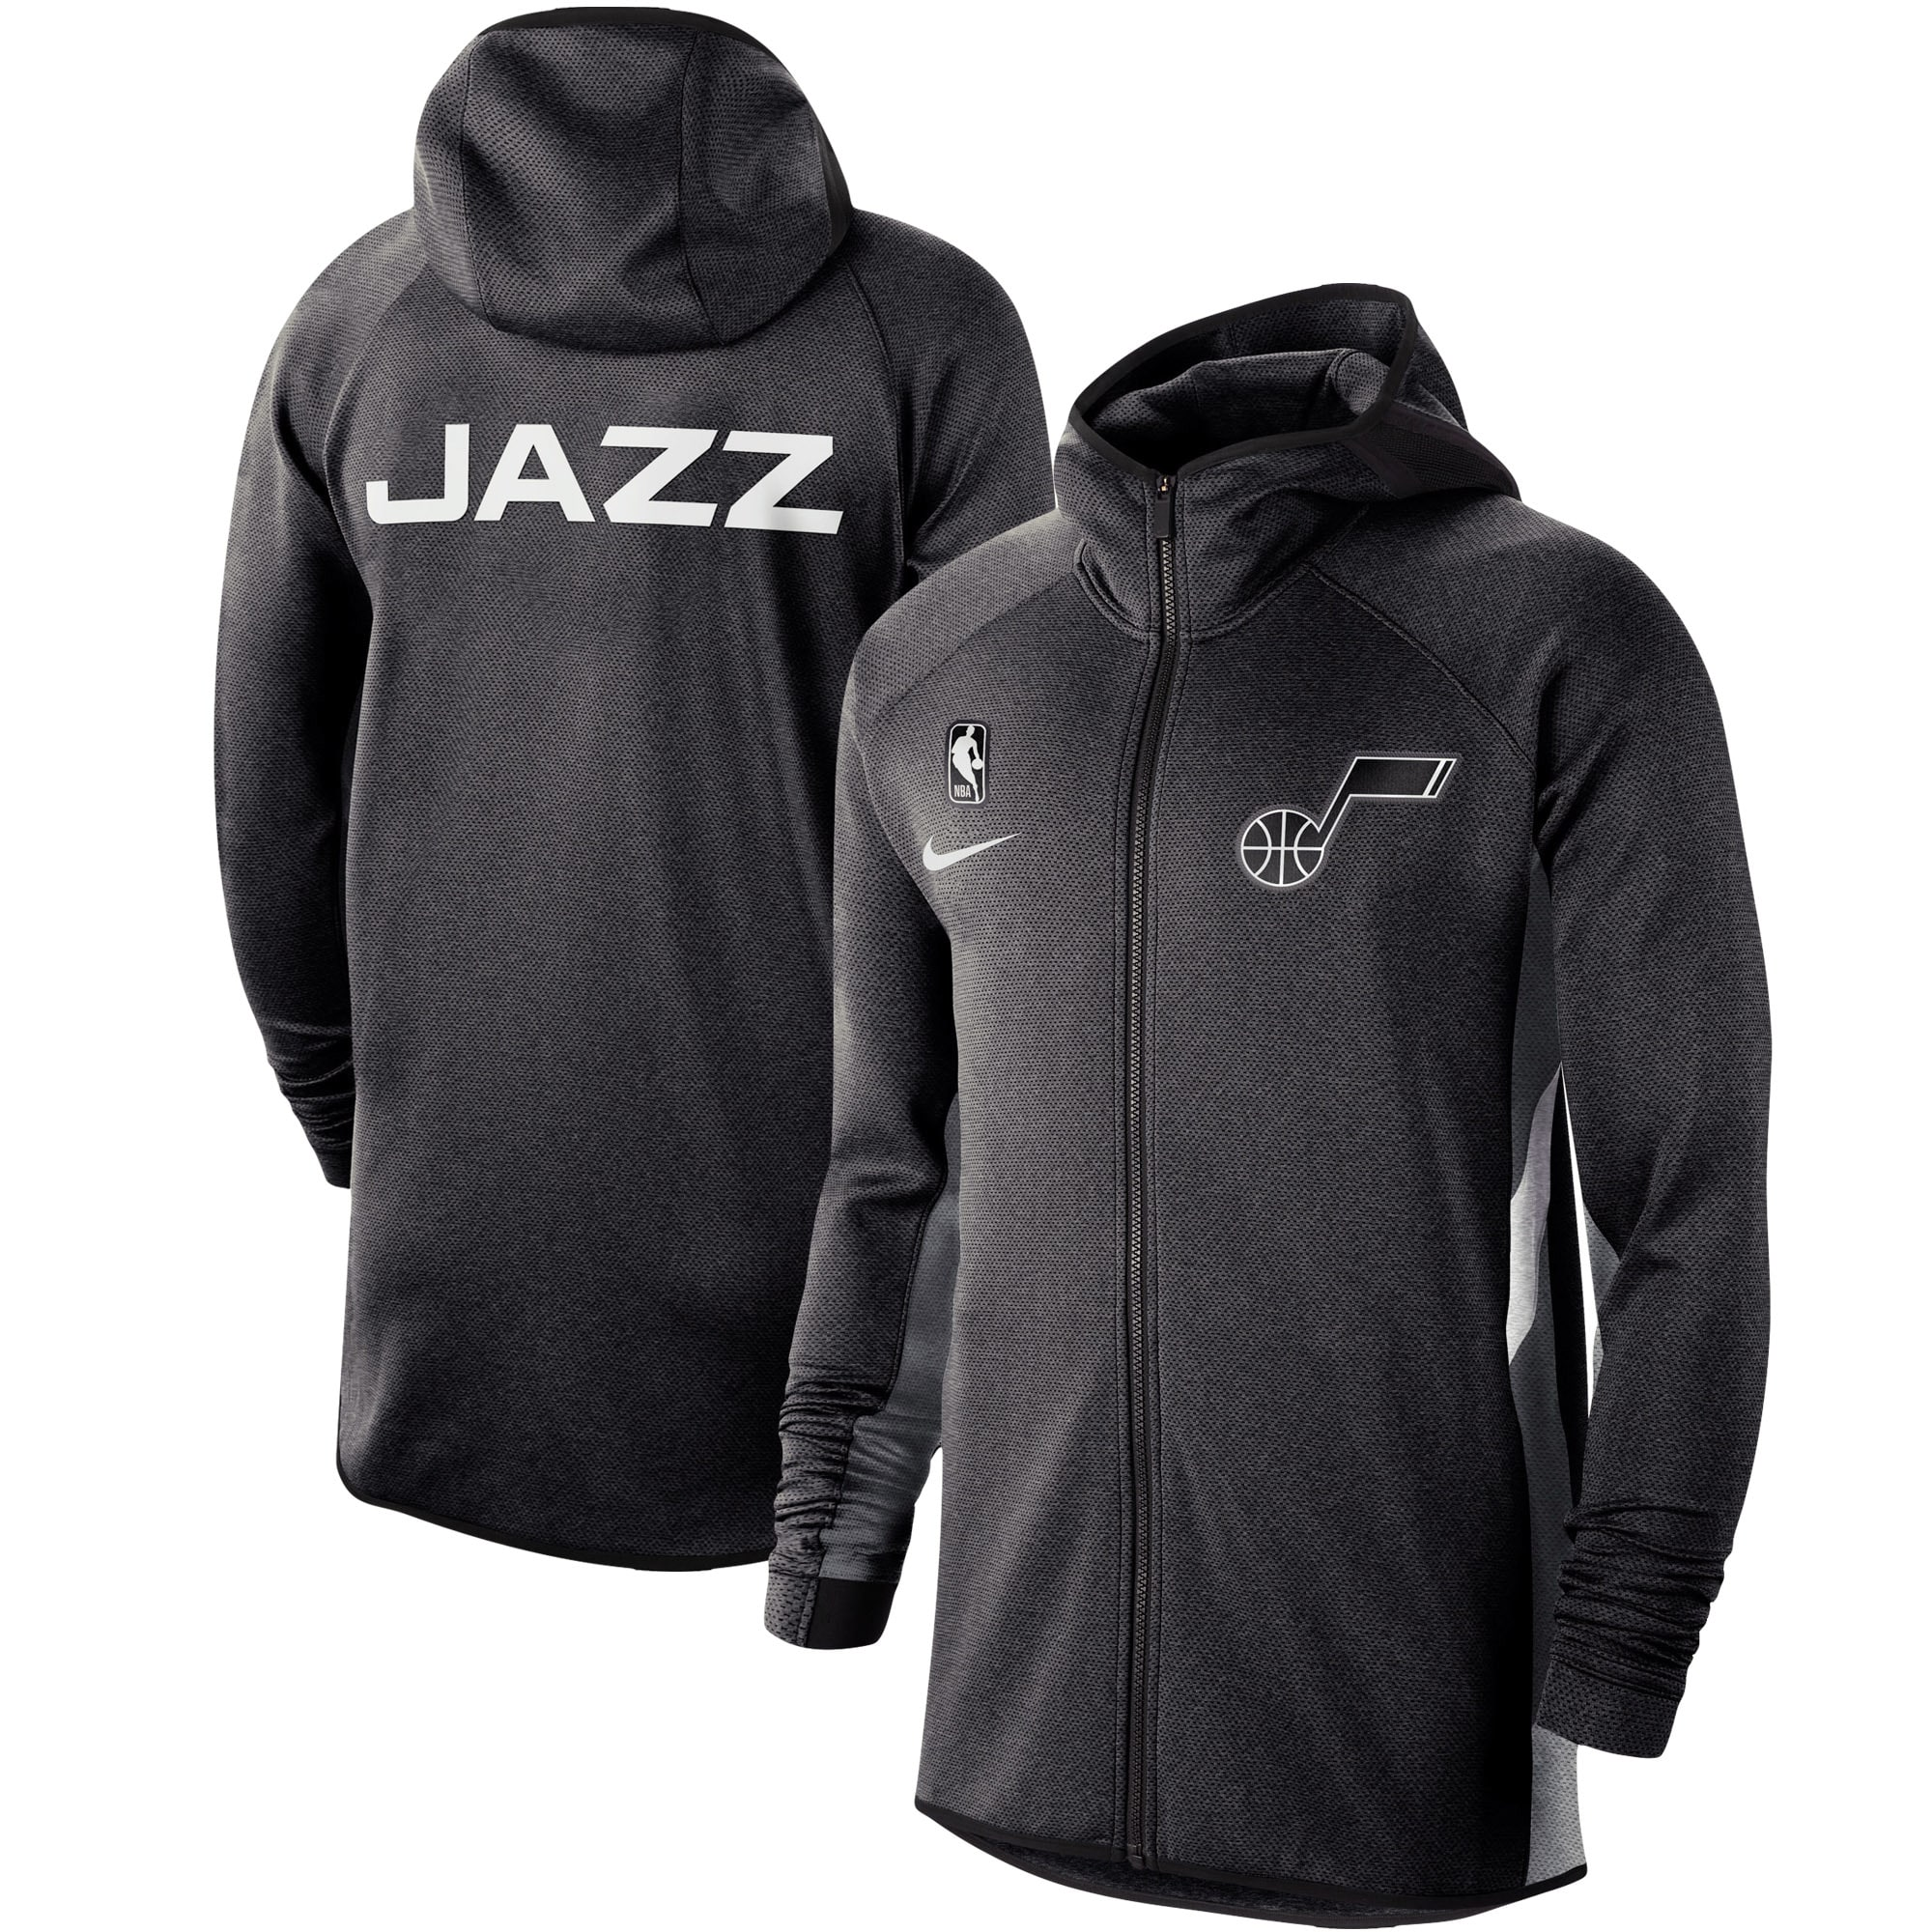 Utah Jazz Nike Authentic Showtime Therma Flex Performance Full-Zip Hoodie - Heather Black